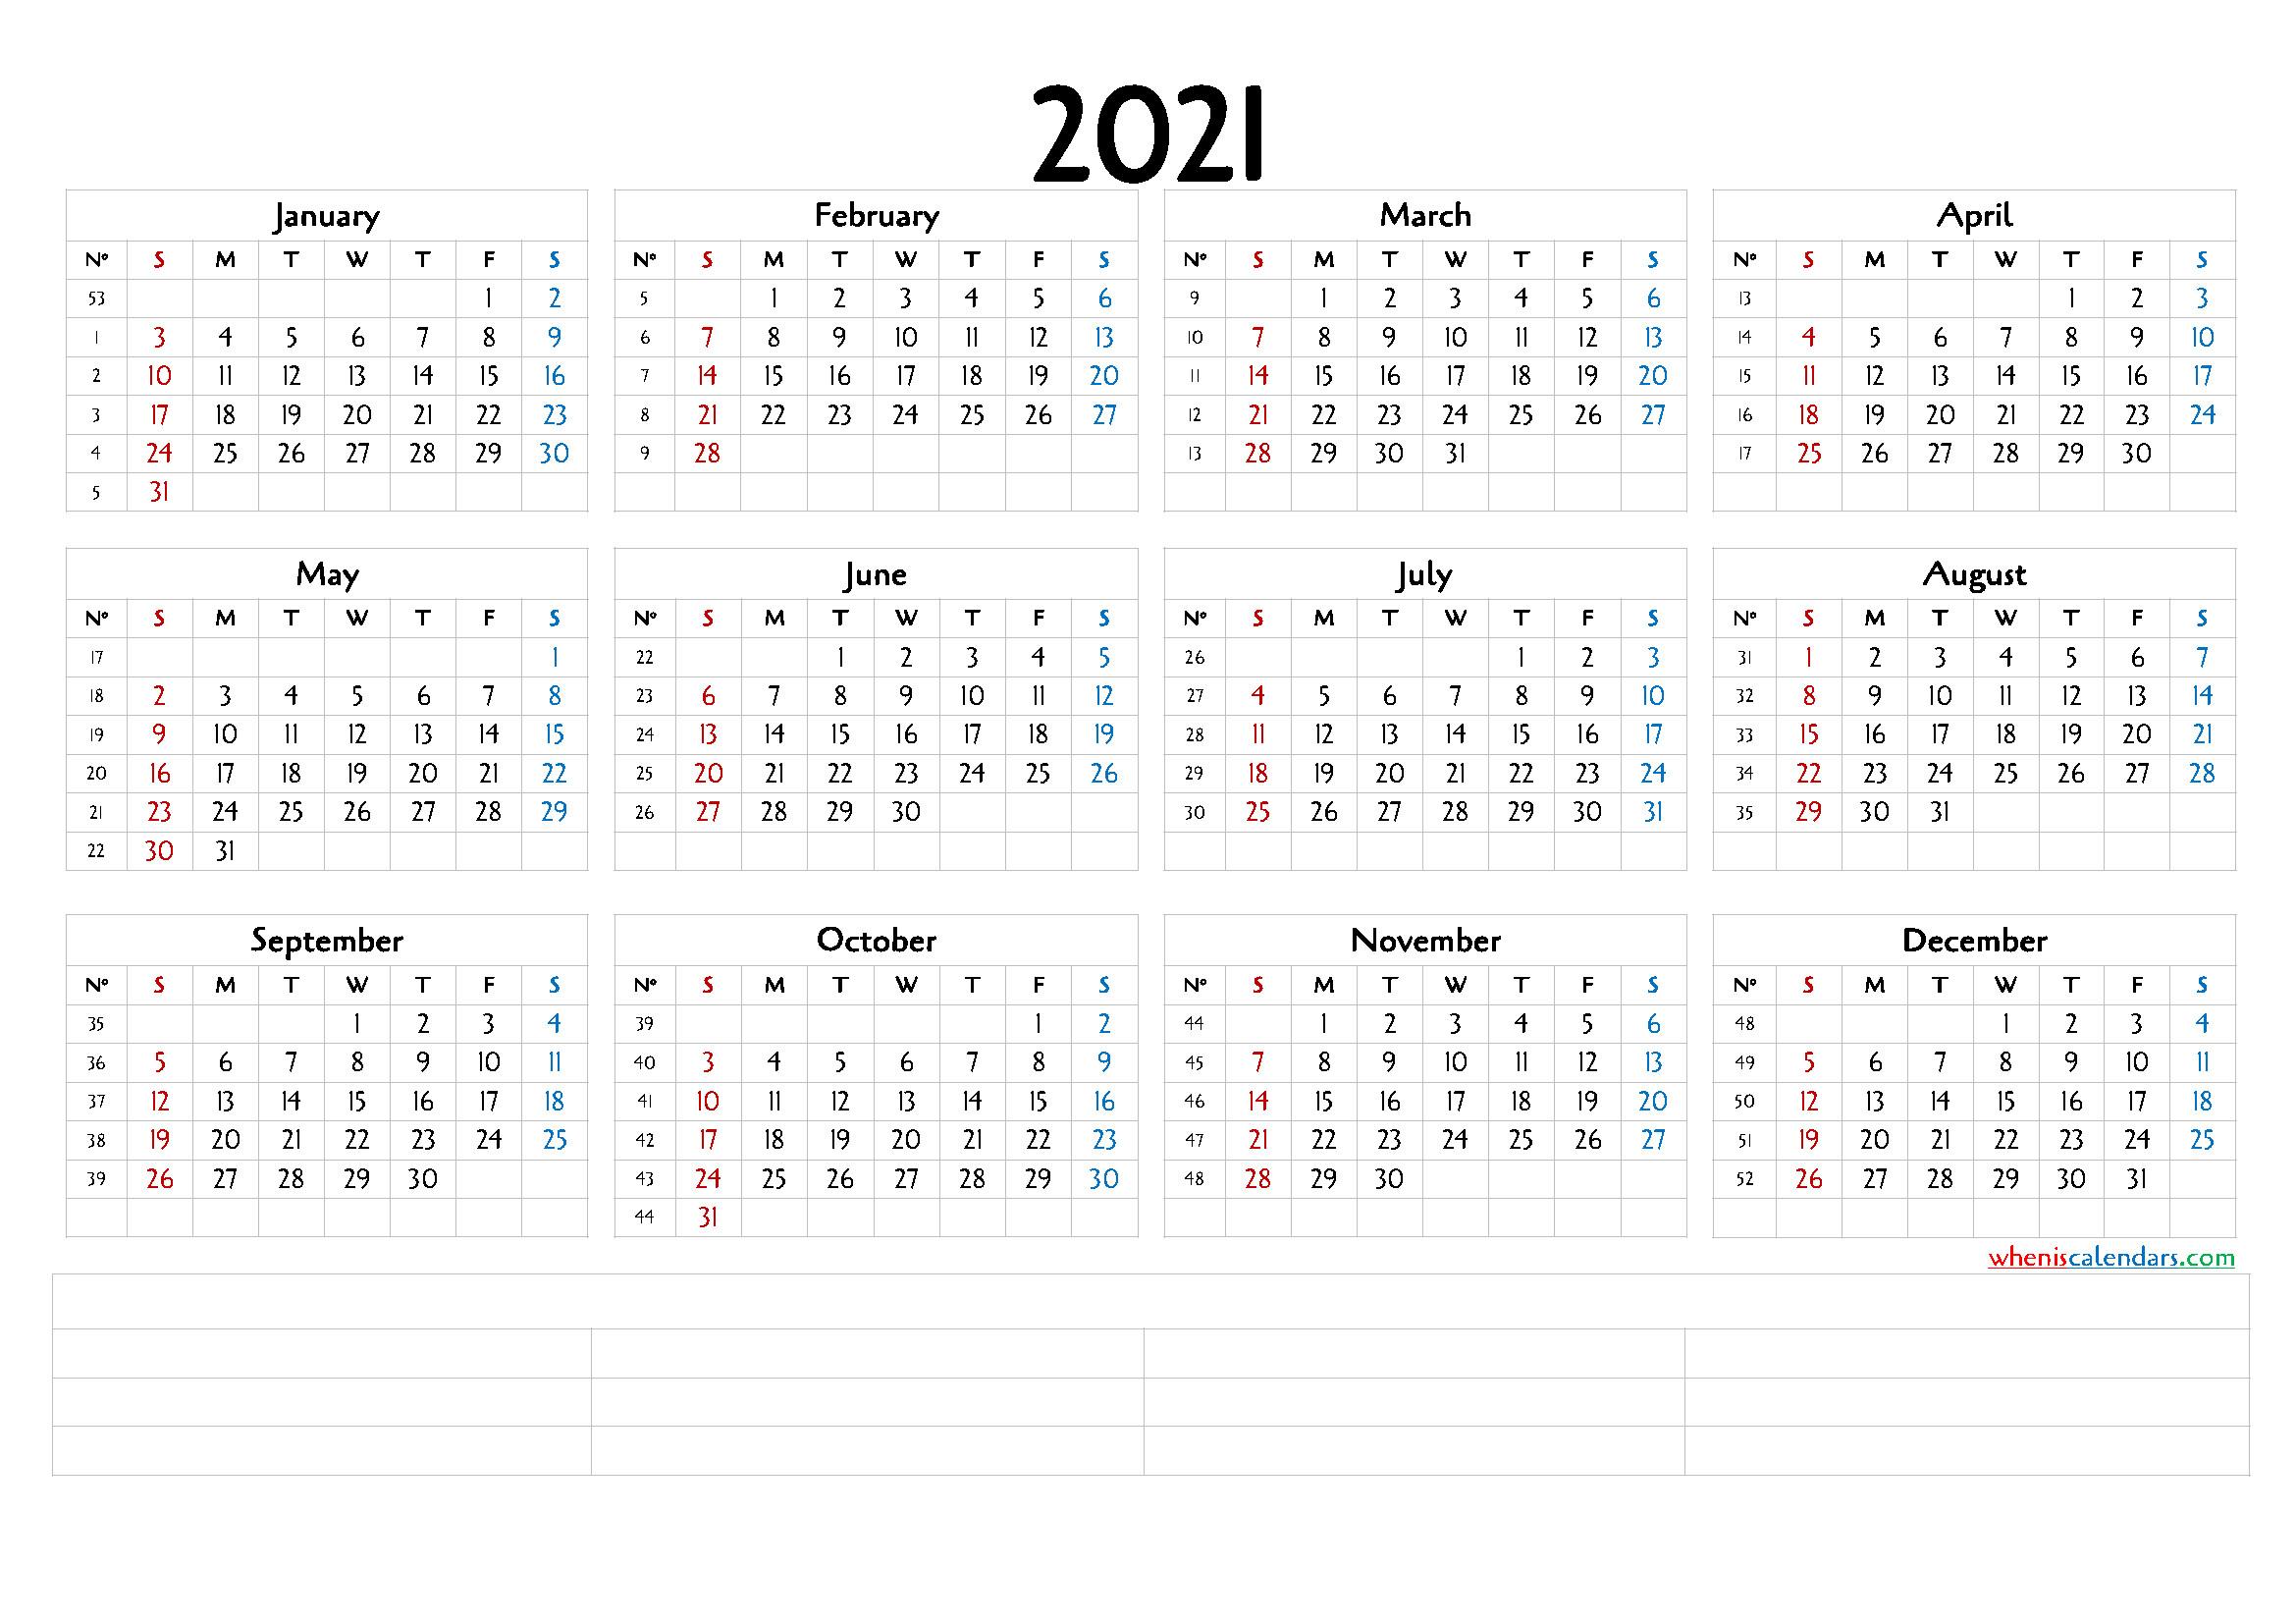 2021 12 Month Calendar   Printable Calendars 2021  Free Printable 12 Month Calendar 2021